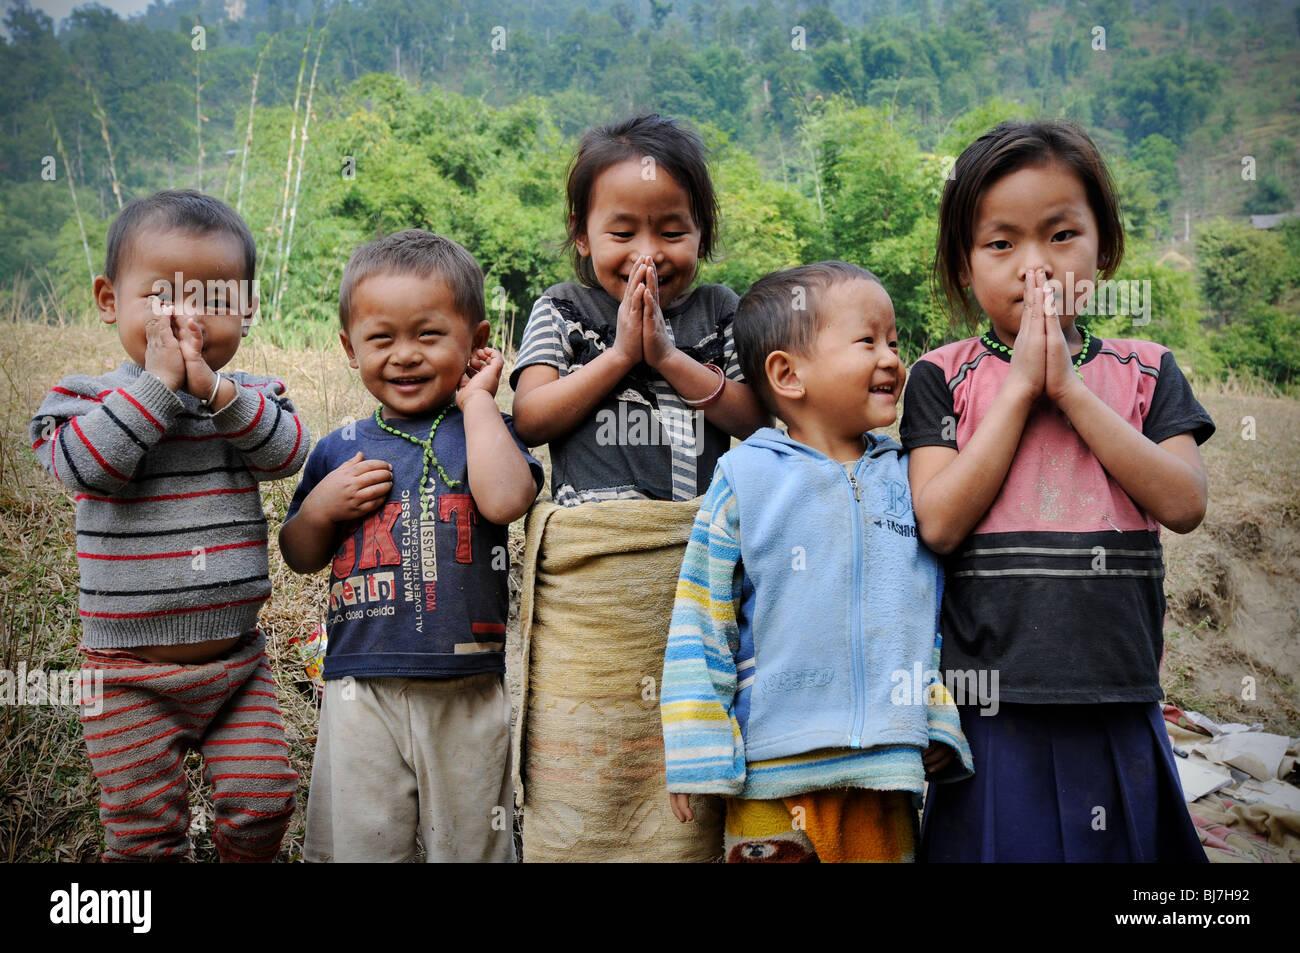 Nepali children in Chyawabesi, Nepal Stock Photo, Royalty ...